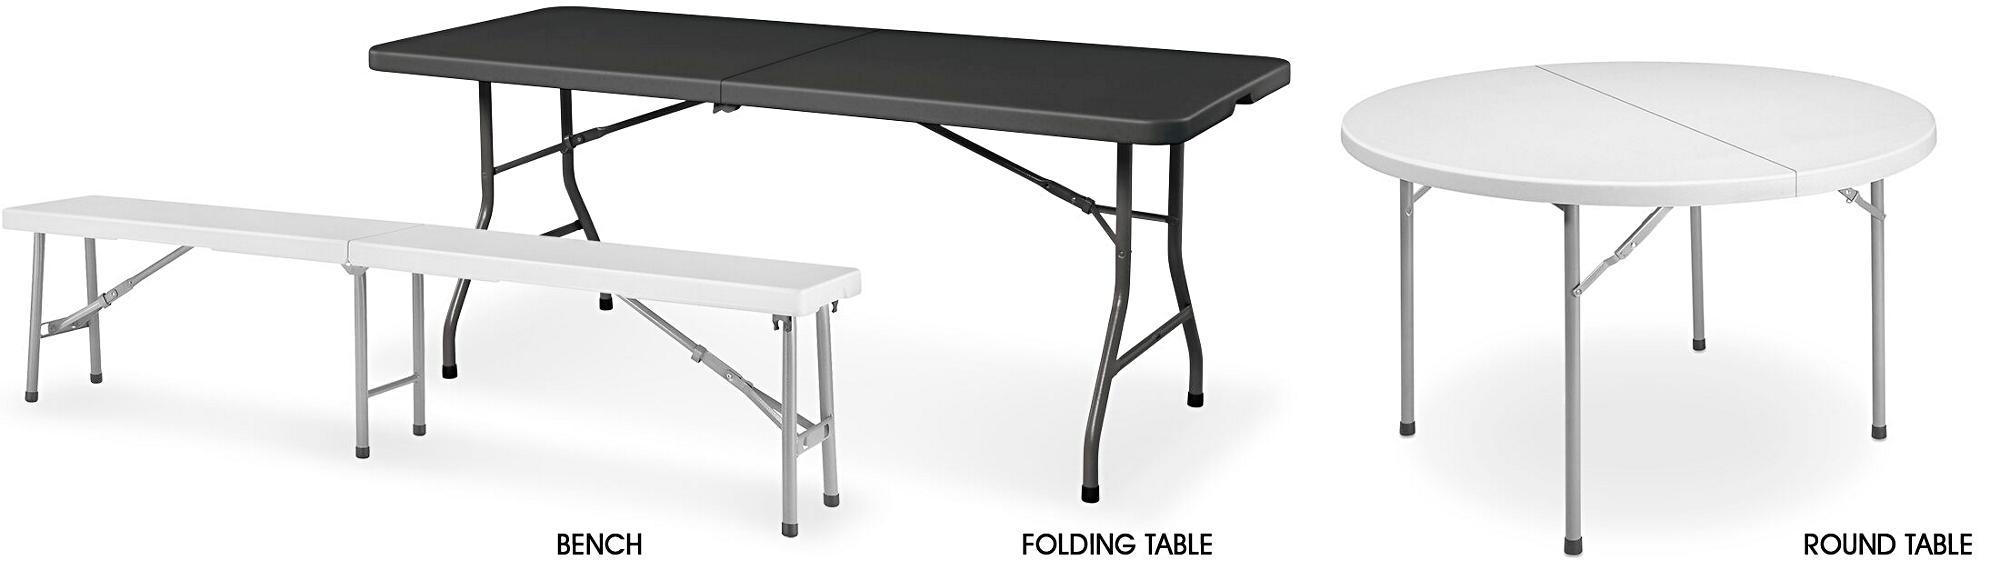 Economy Fold-In-Half Tables